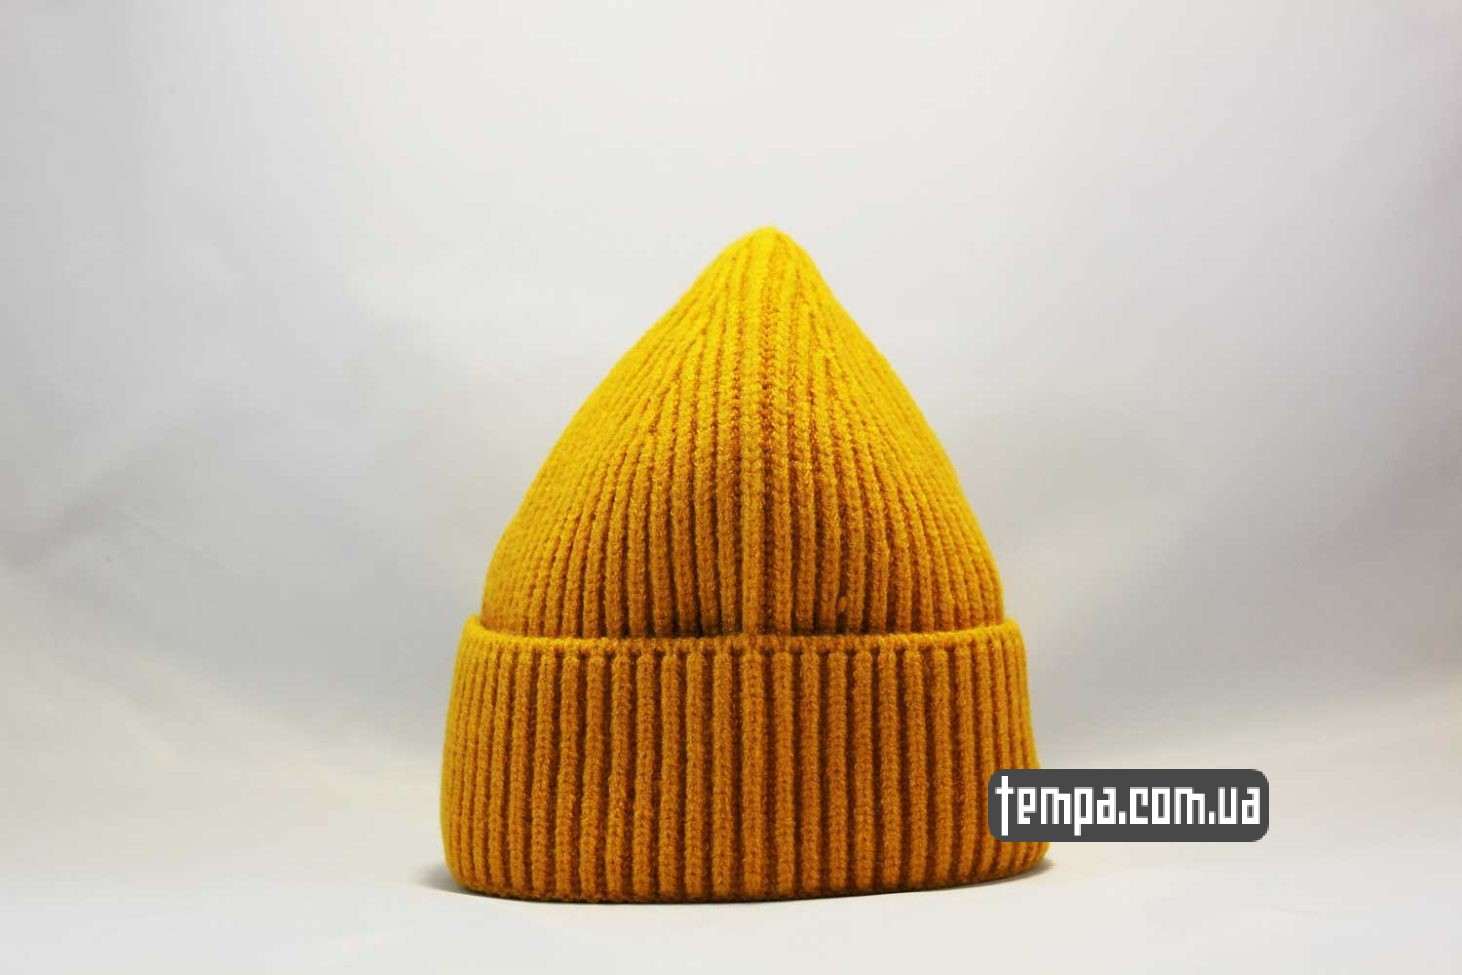 бини кархарт шапка beanie Carhartt оранжевая шерстяная